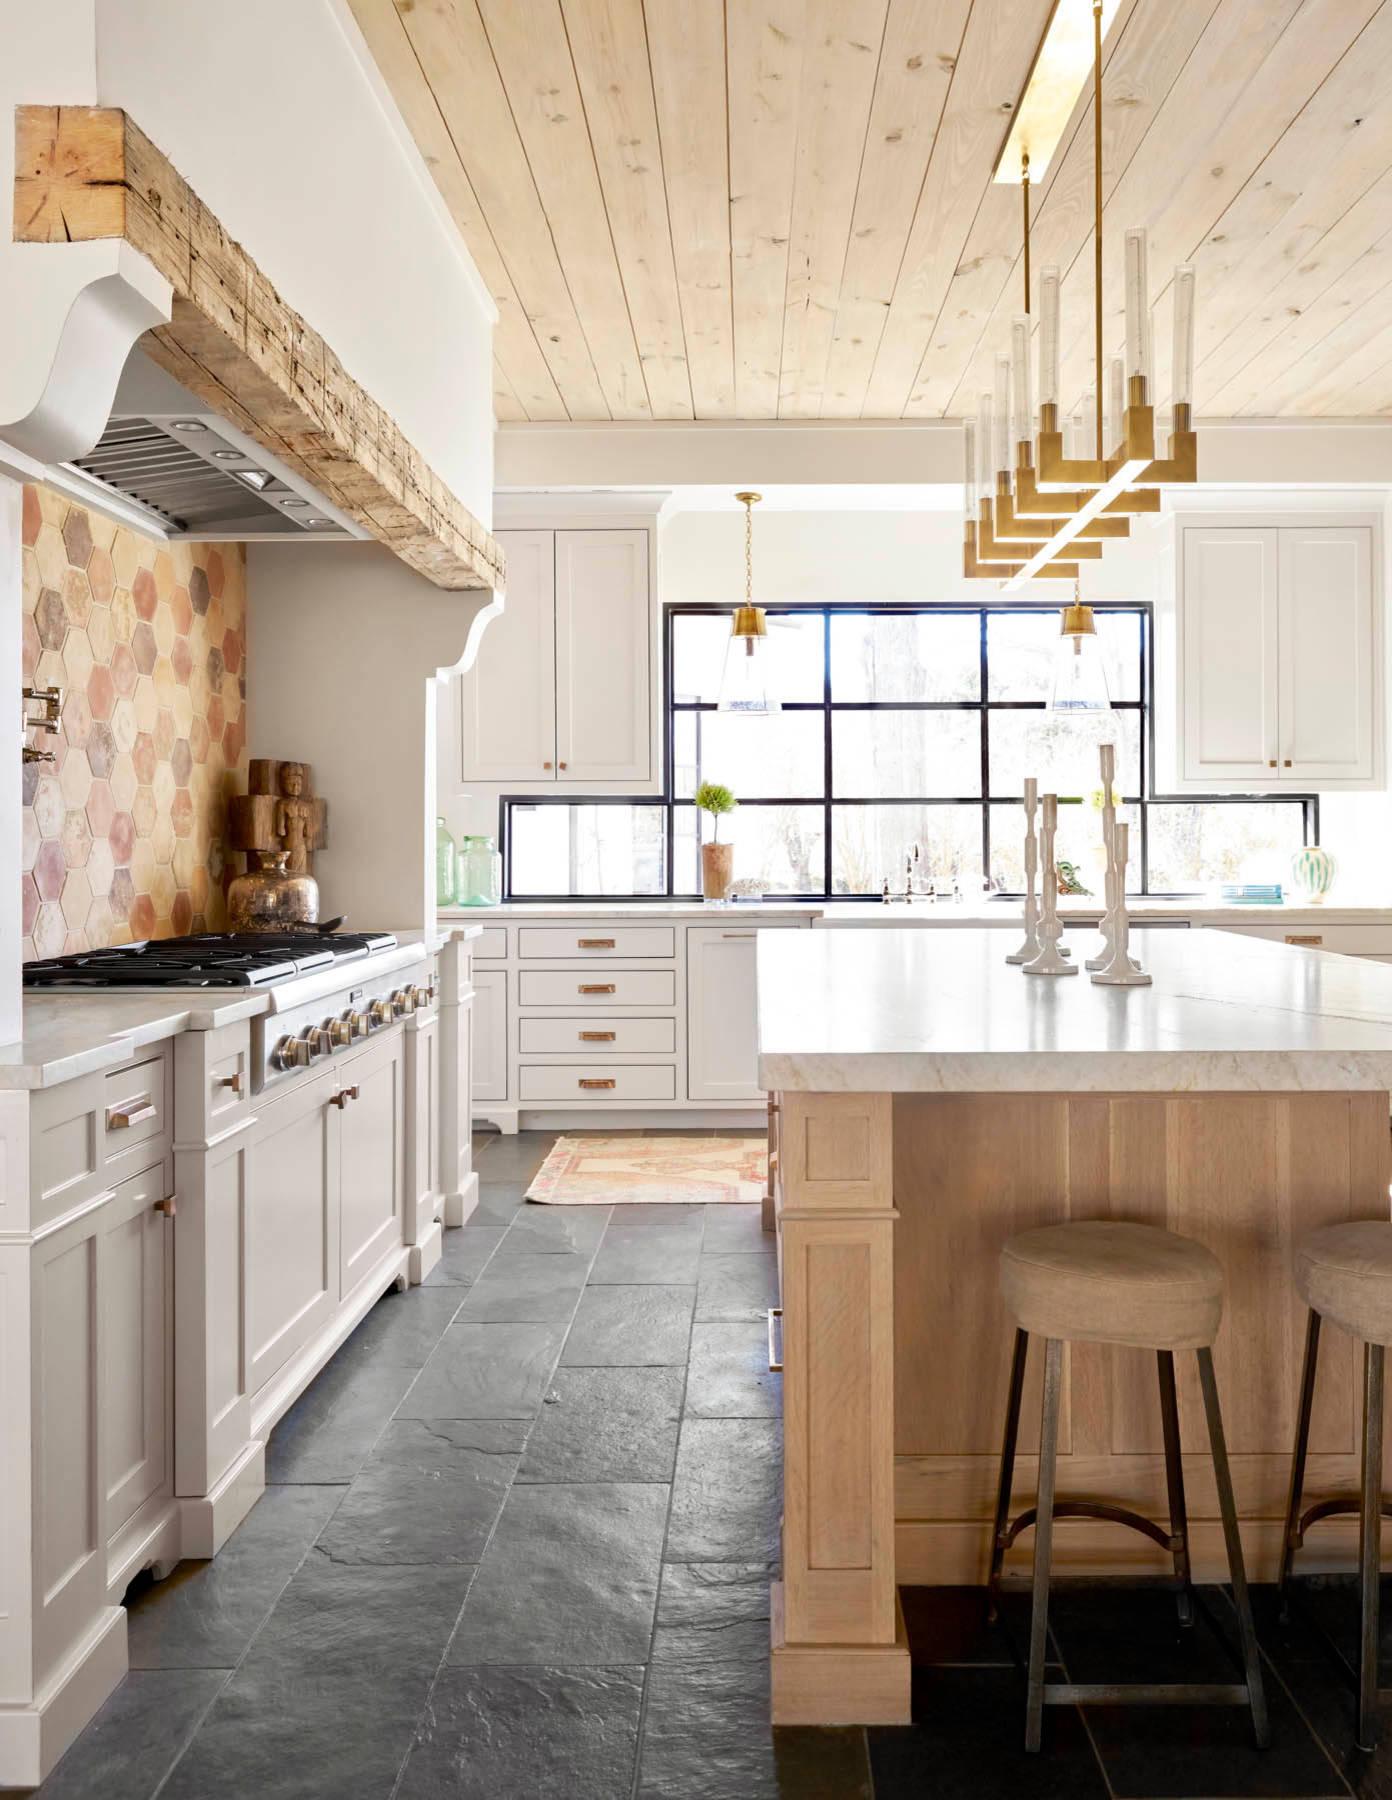 75 Beautiful Slate Floor Kitchen Pictures Ideas January 2021 Houzz